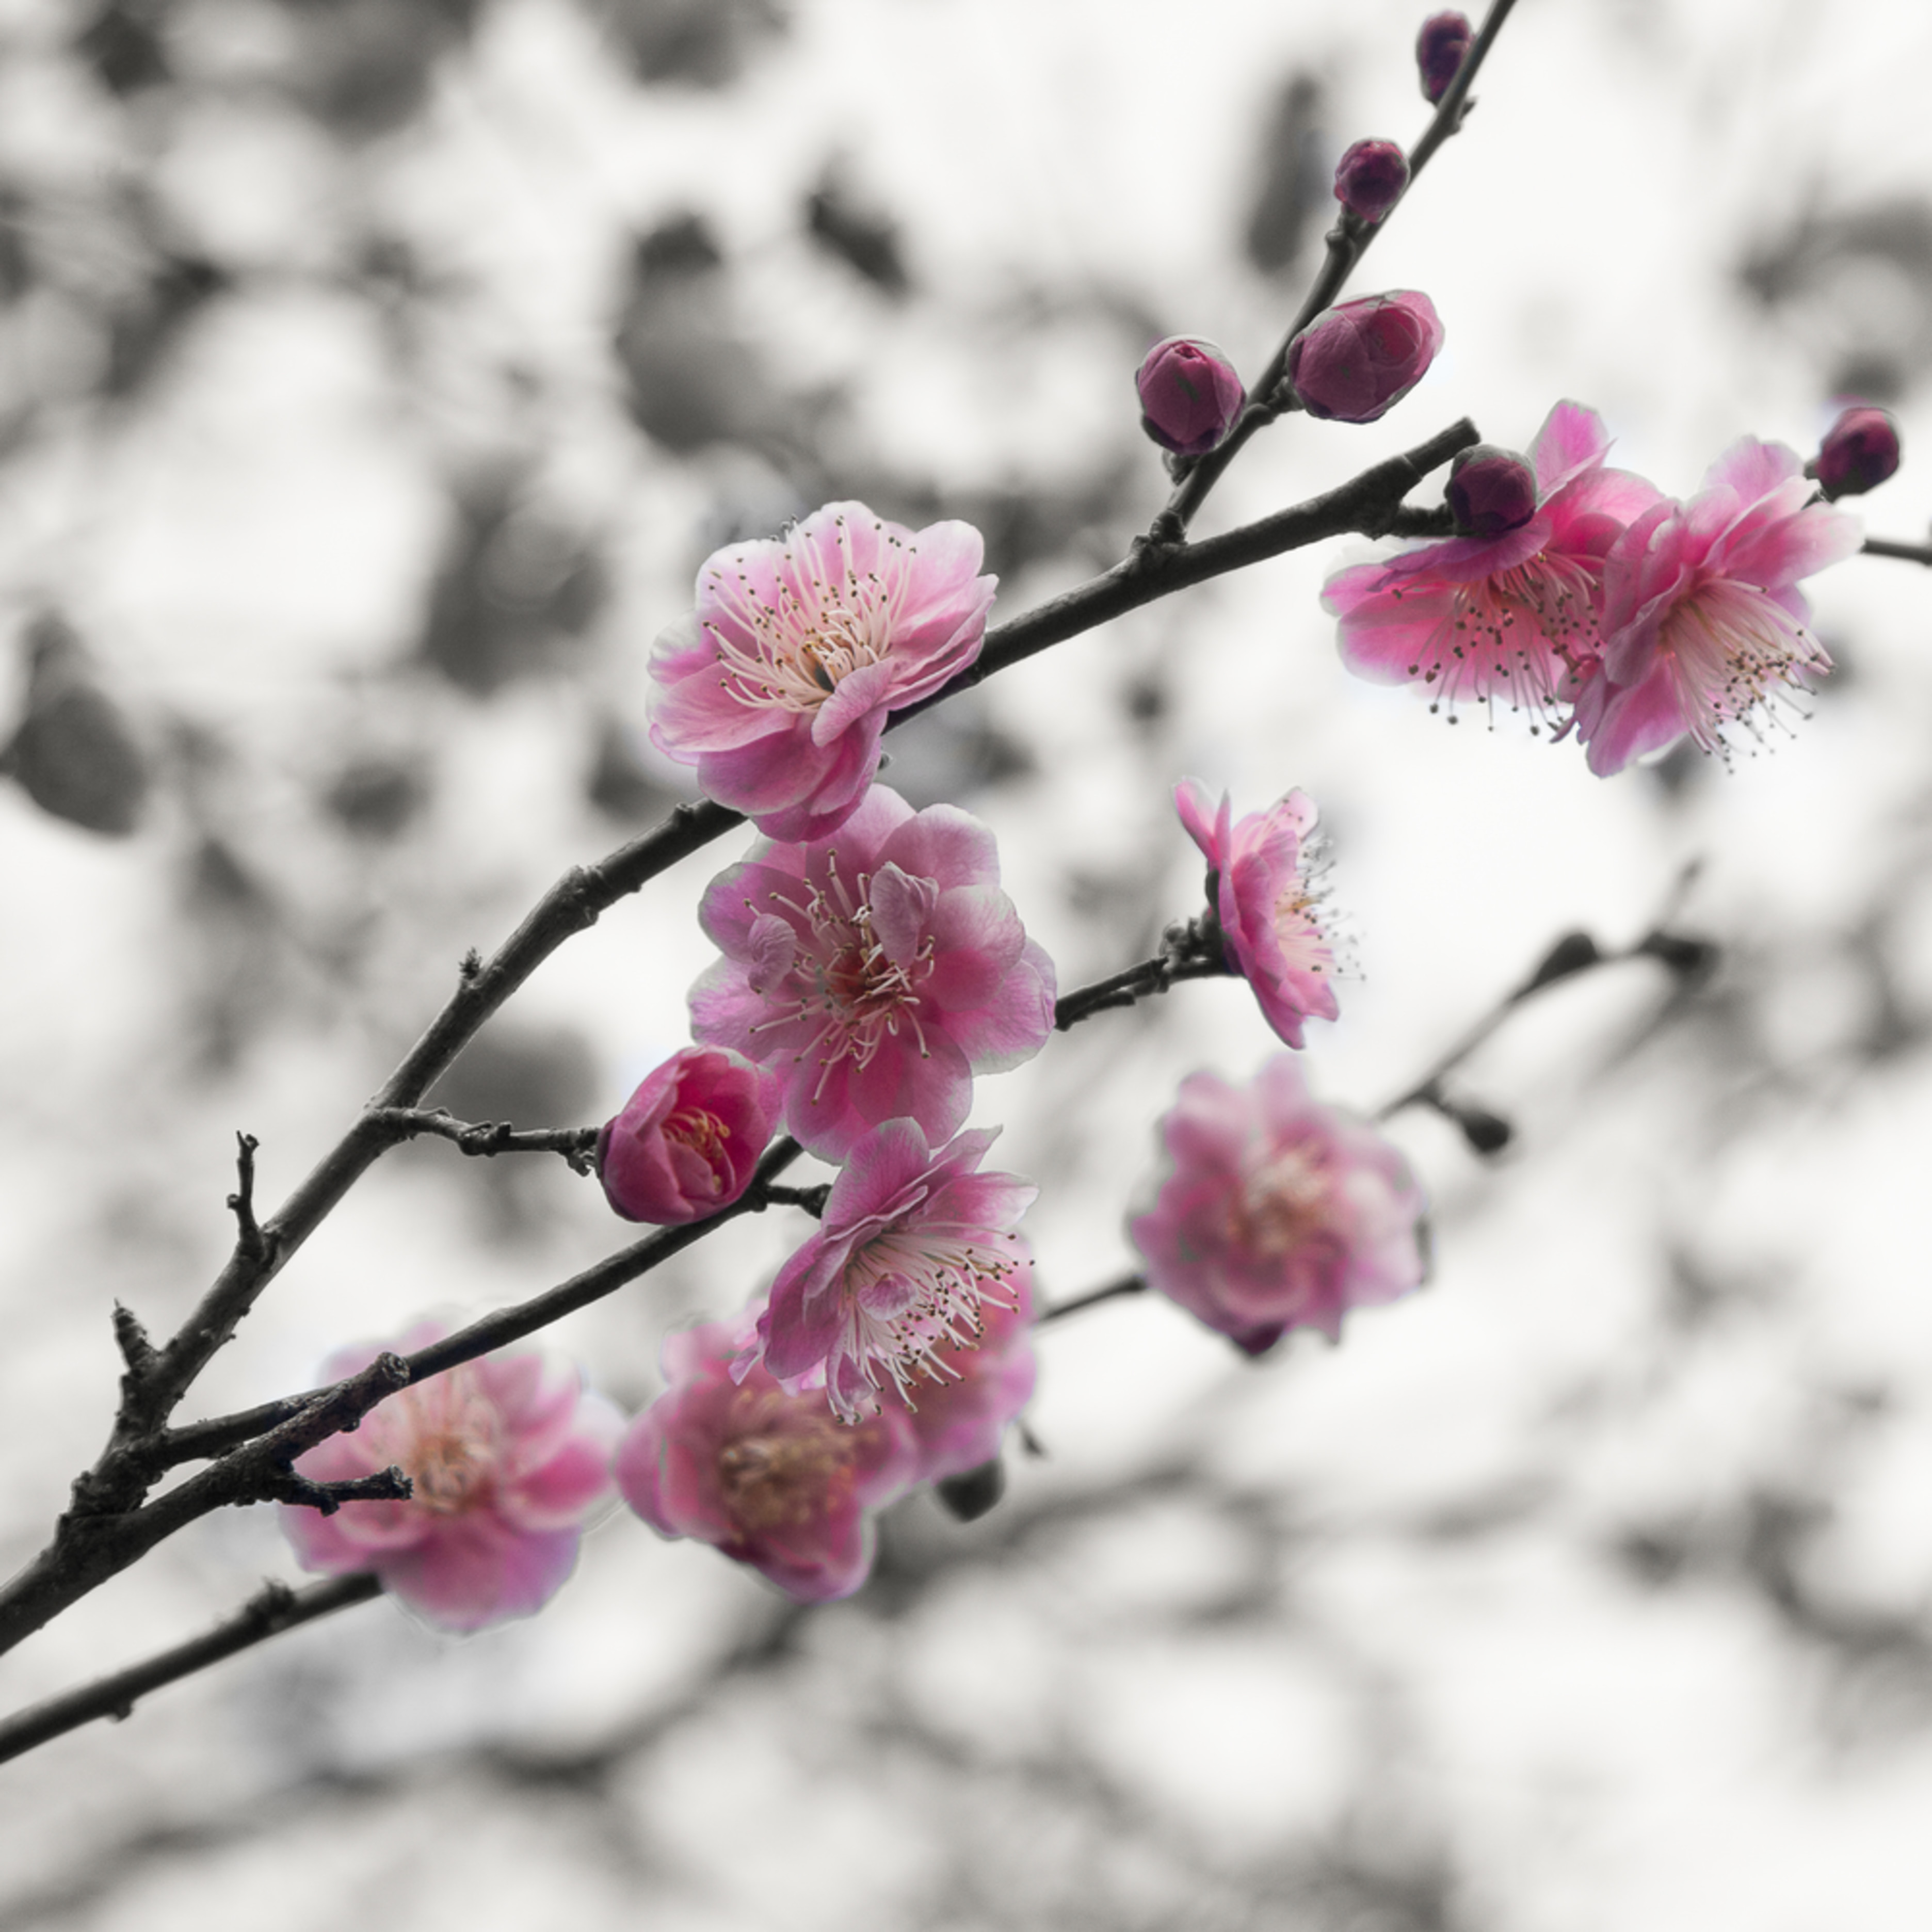 Cherry blossoms japan zvnesd